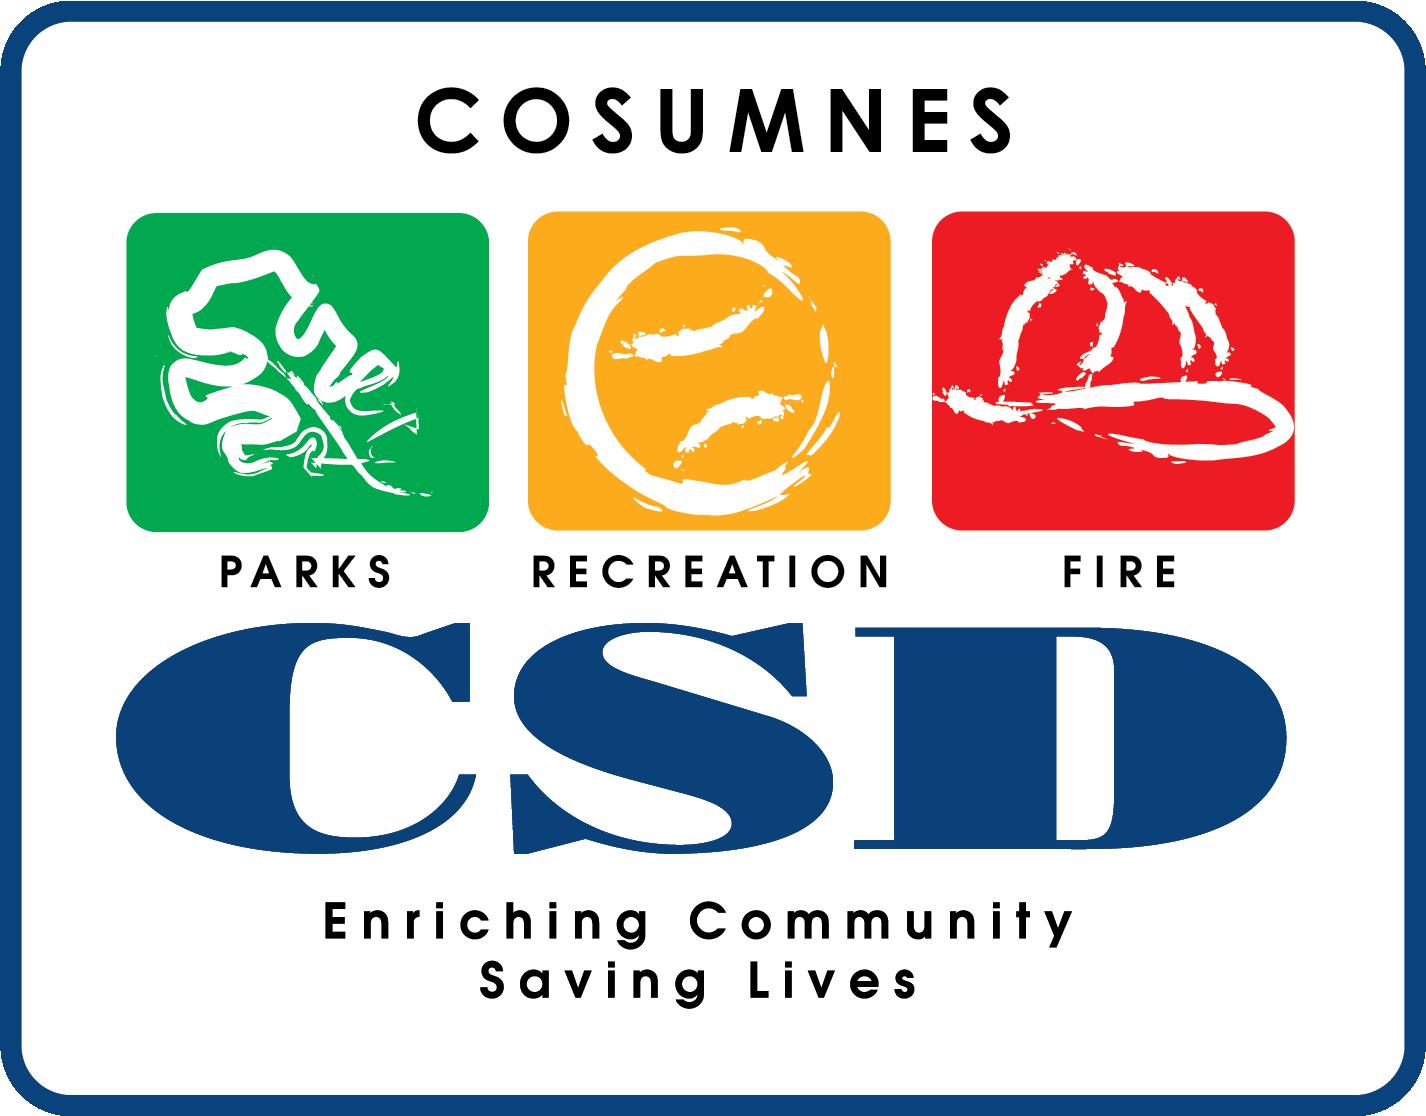 Cosumnes CSD Logo, Parks, Recreation, Fire, Enriching Community, Saving Lives